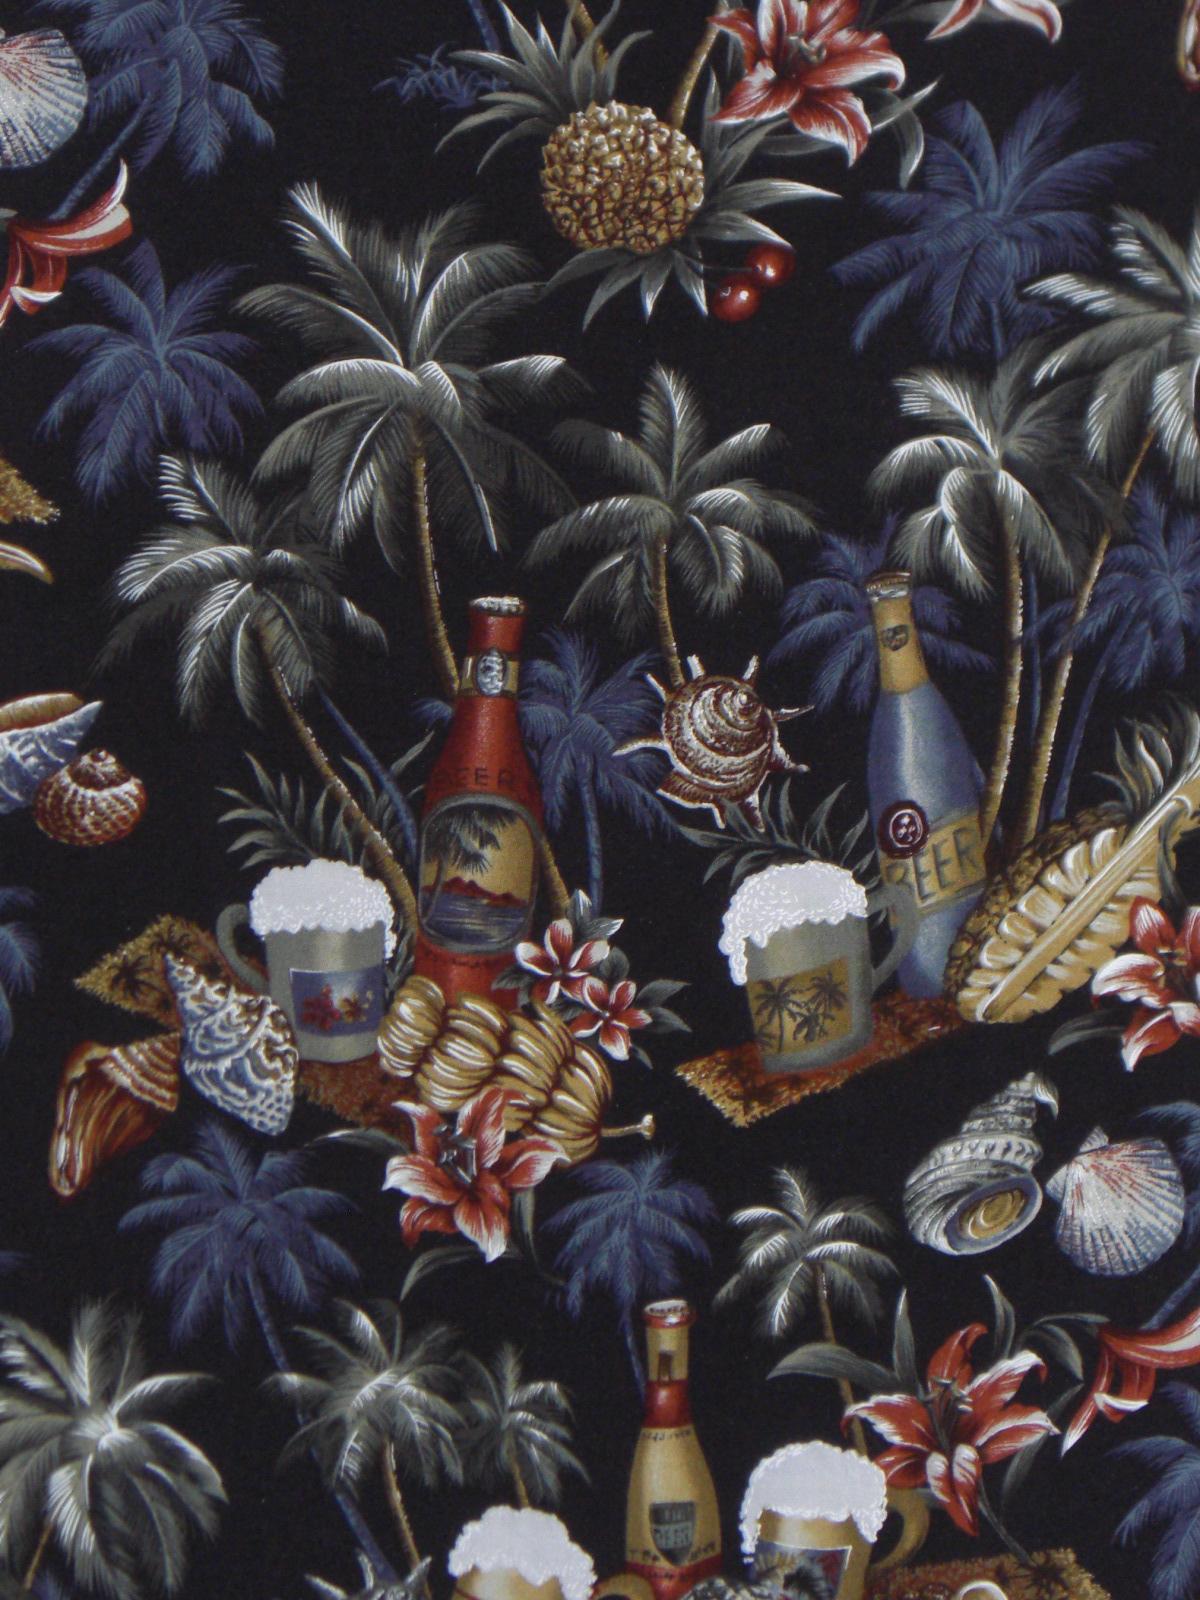 Van Heusen Hawaiian Shirt Black Blue Red Gray Bottles Large